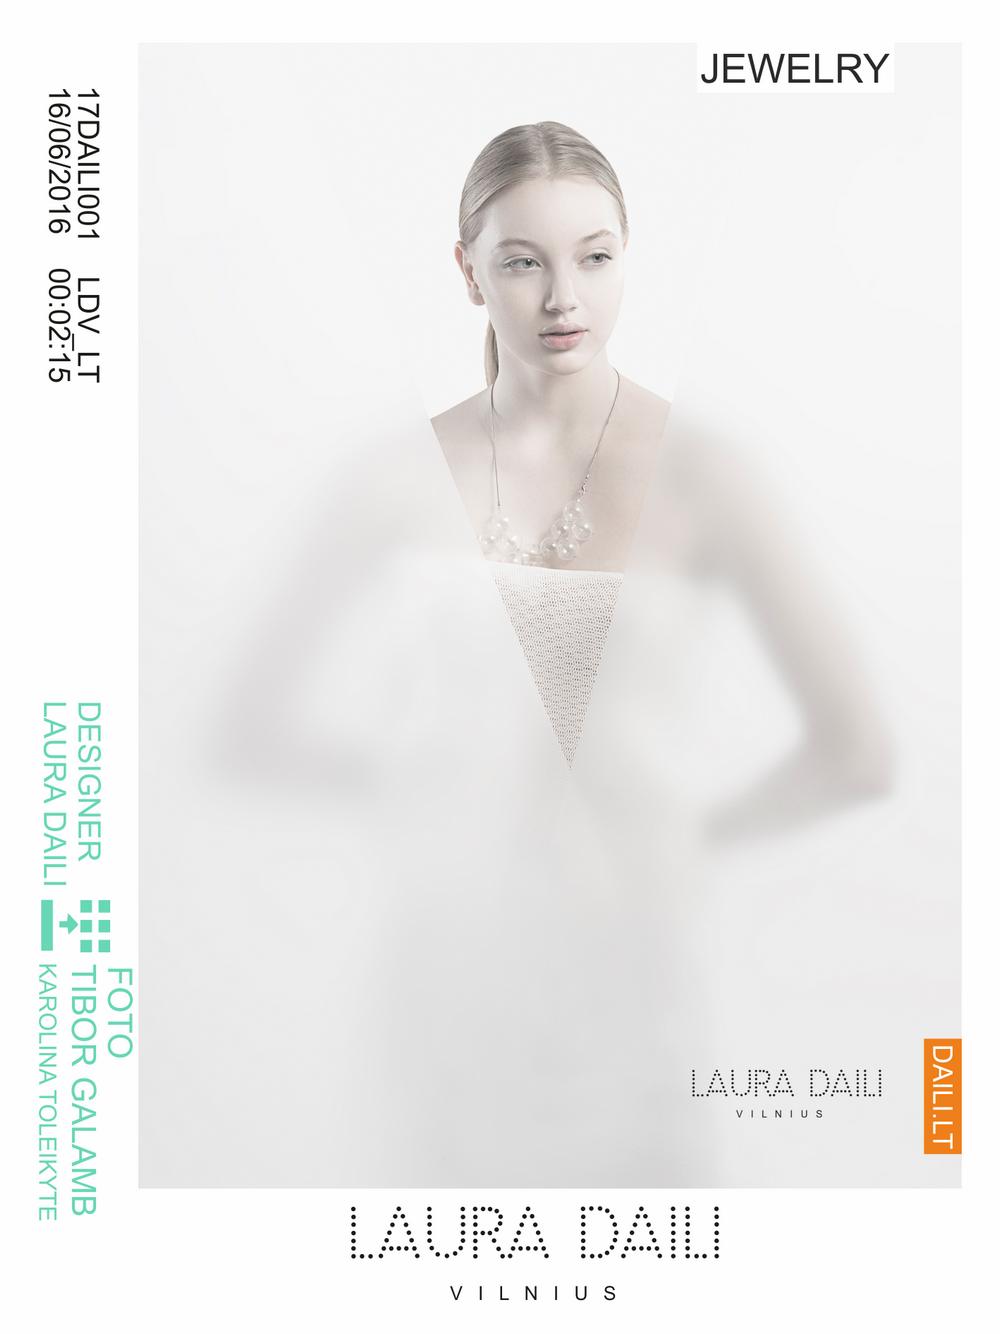 Laura Daili Vilnius , model Karolina Toleikyte, foto Tibor Galamb